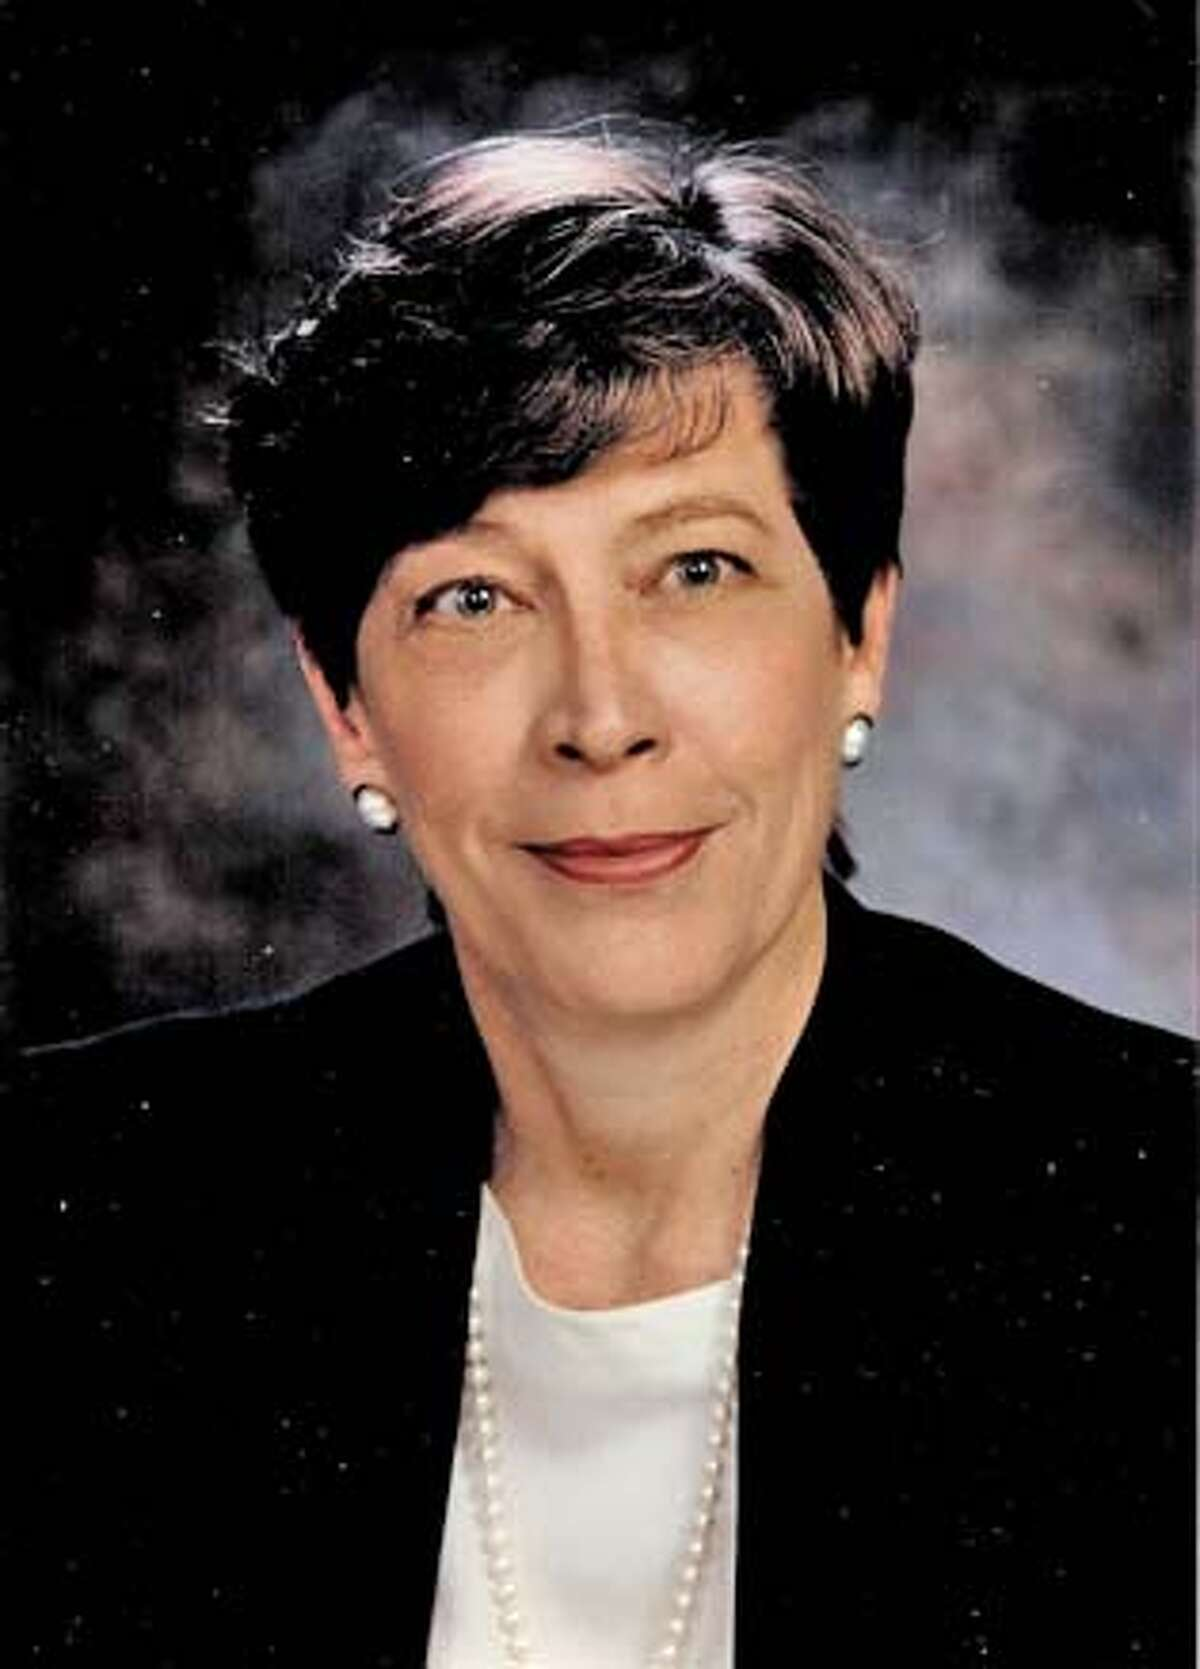 Obituary photo of Felicia Stewart.